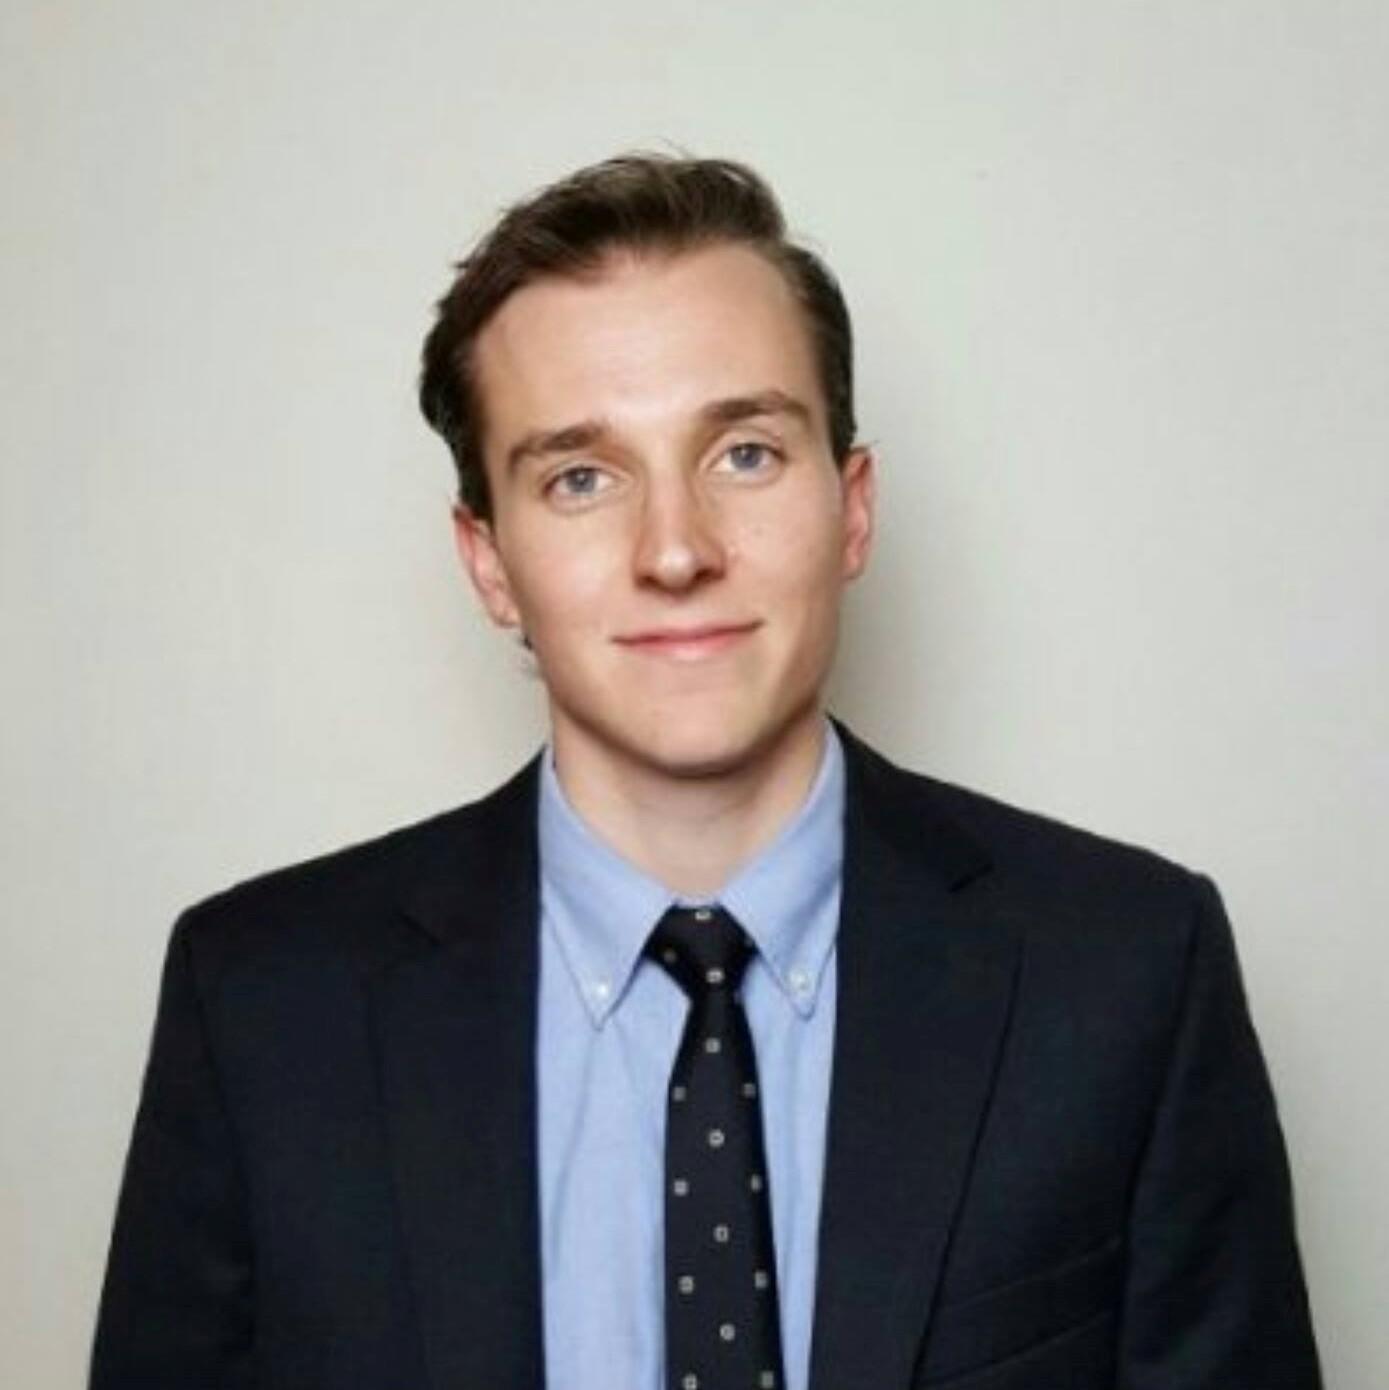 Nicholas Golm, Bankers Life Agent